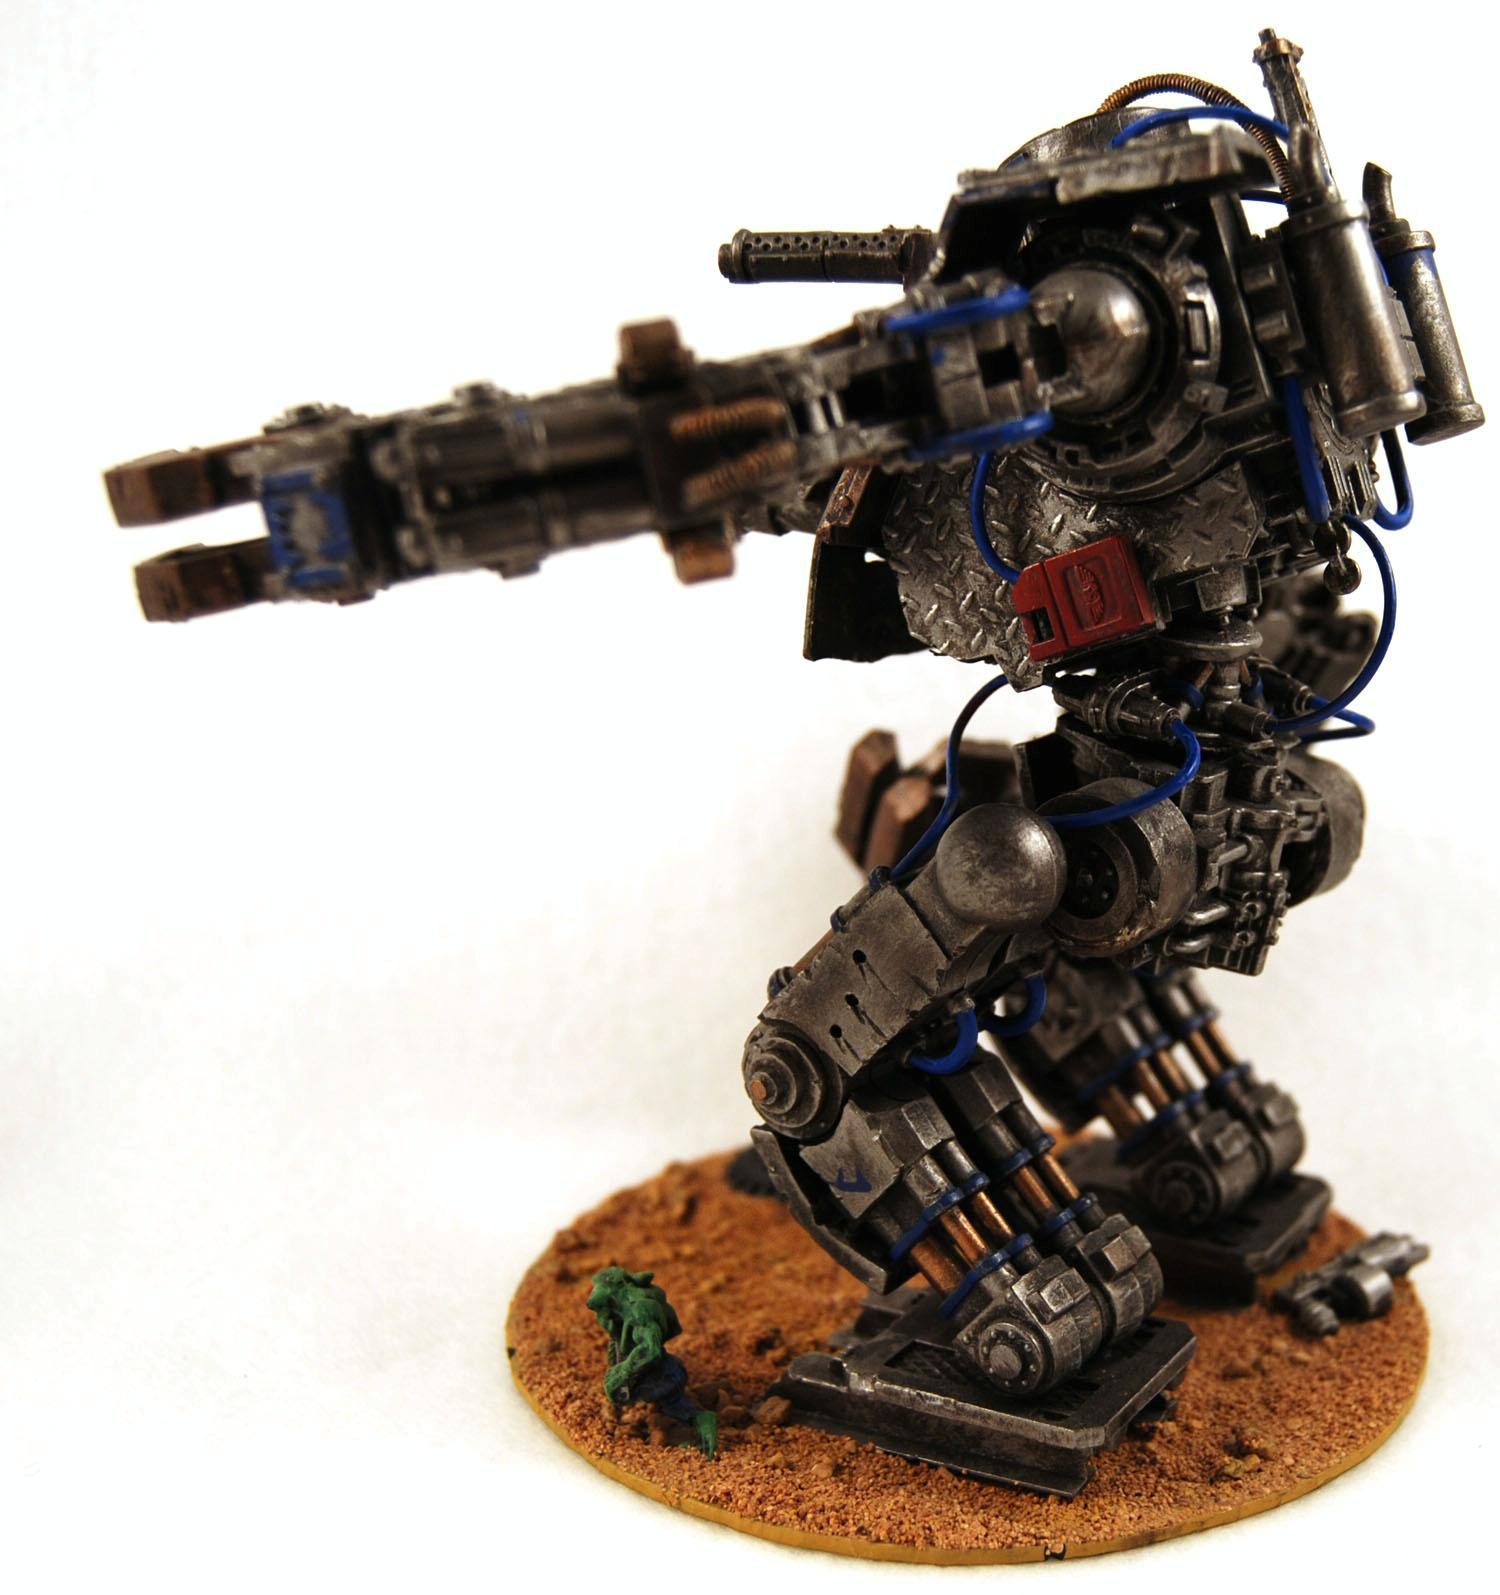 Deathskulls, Defiler, Looted, Orks, Plasticard, Scratch Build, Stompa, Warhammer 40,000